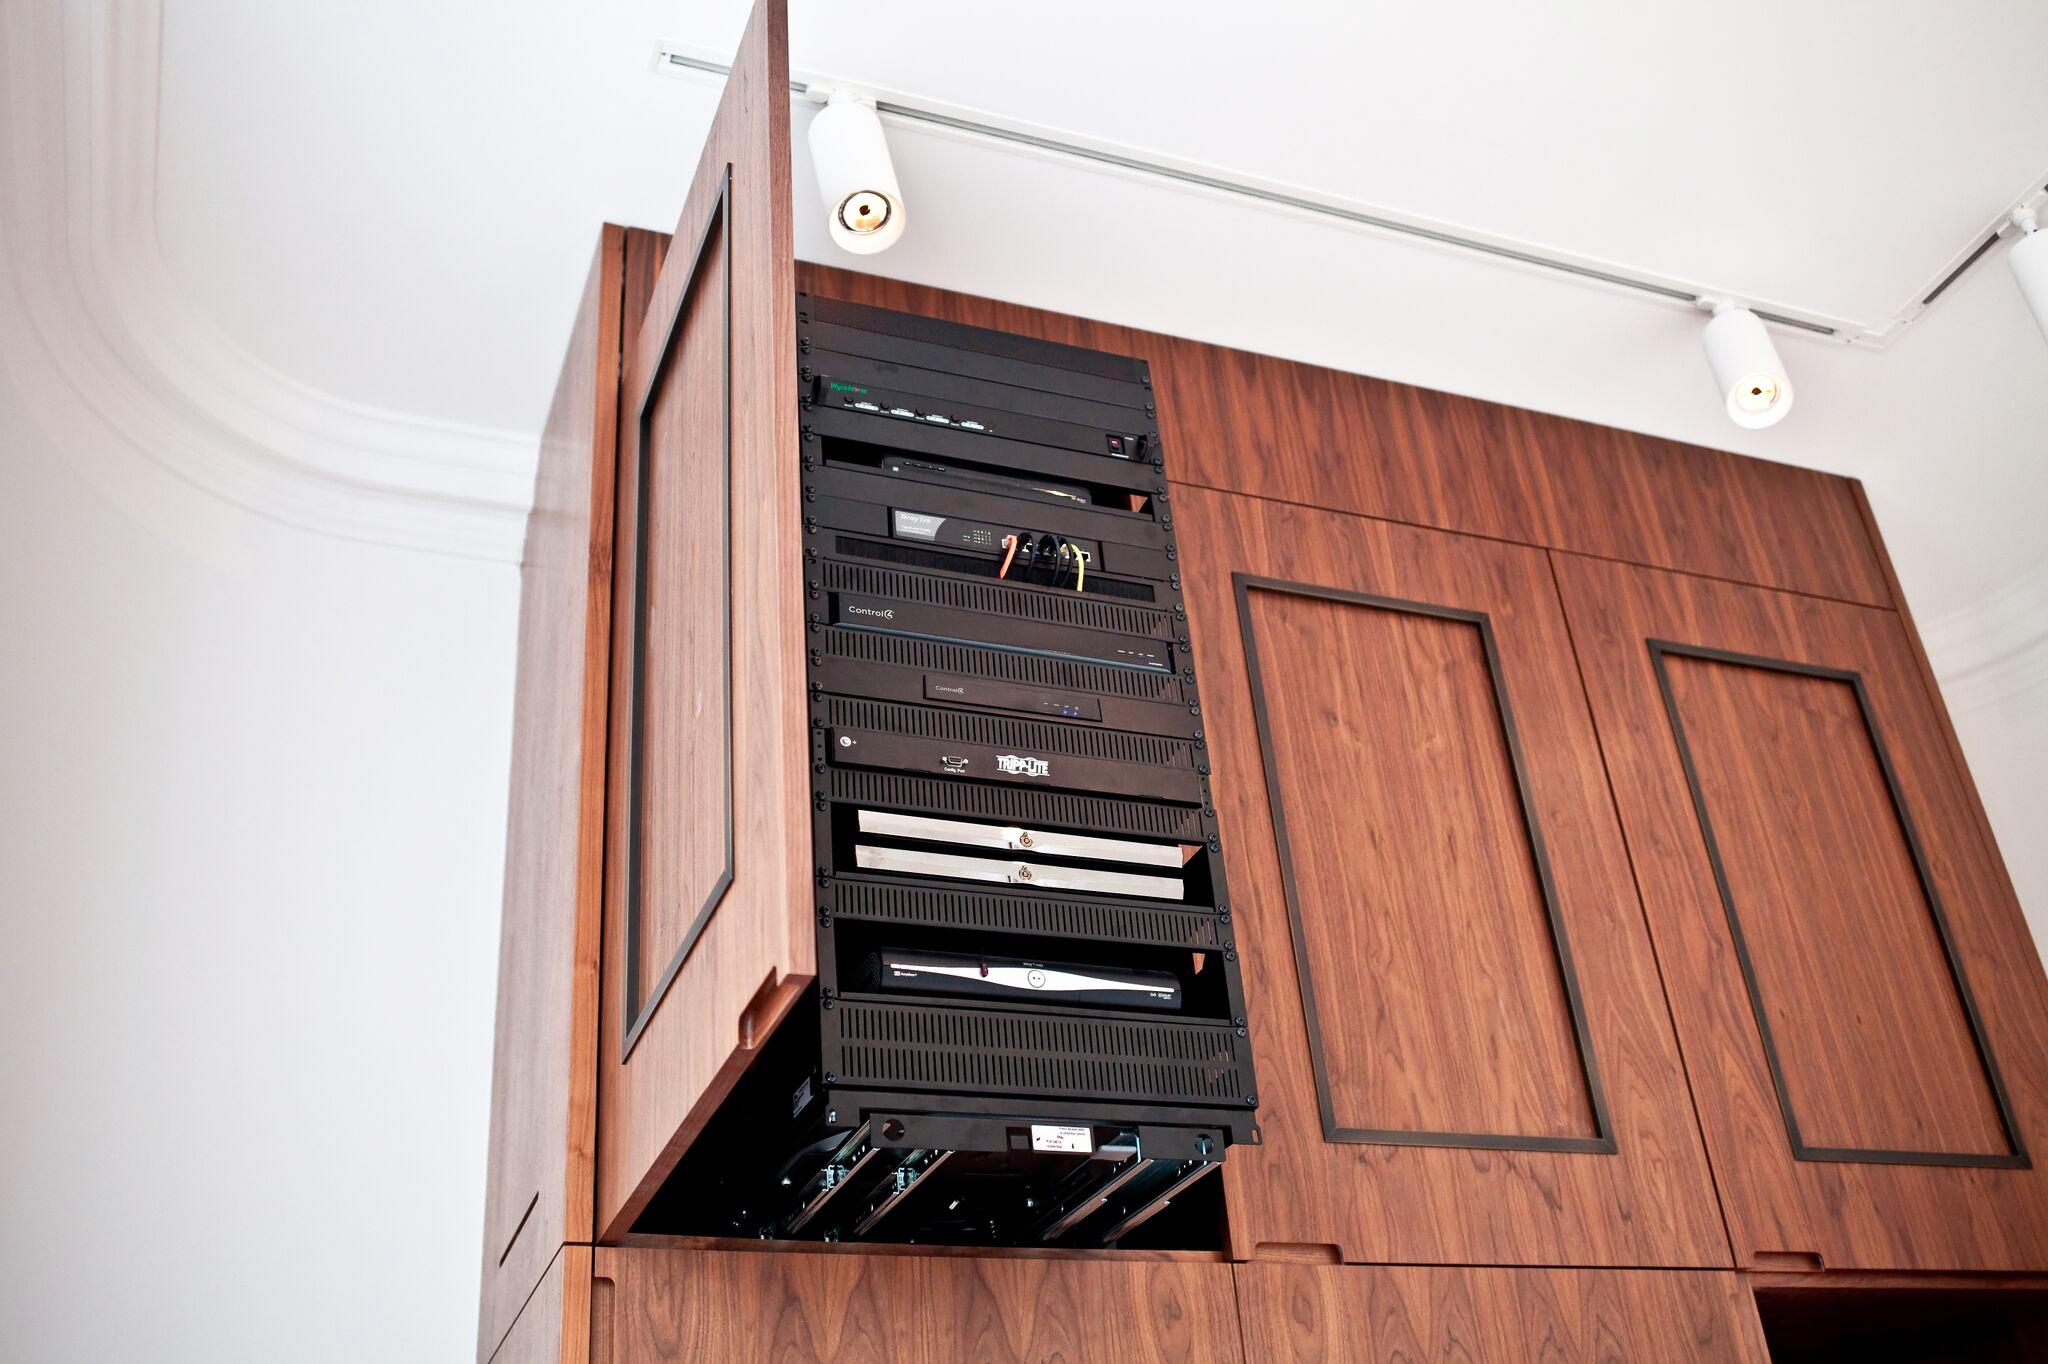 Smart Home Rack Heat Management